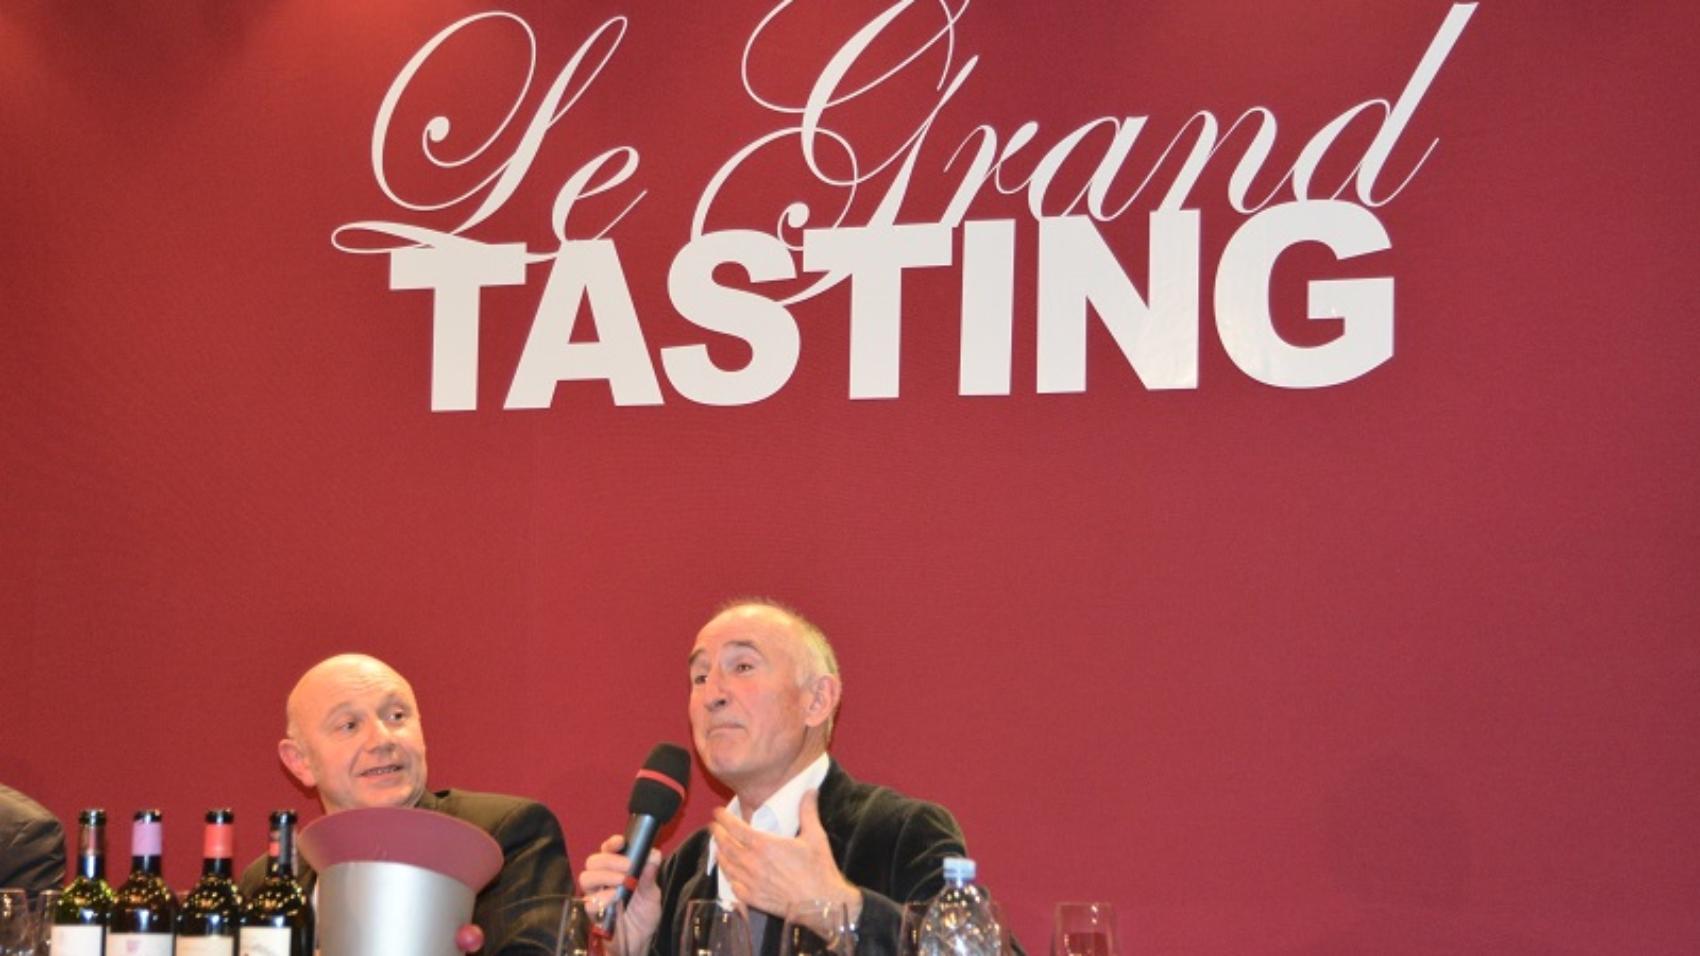 Grand tasting